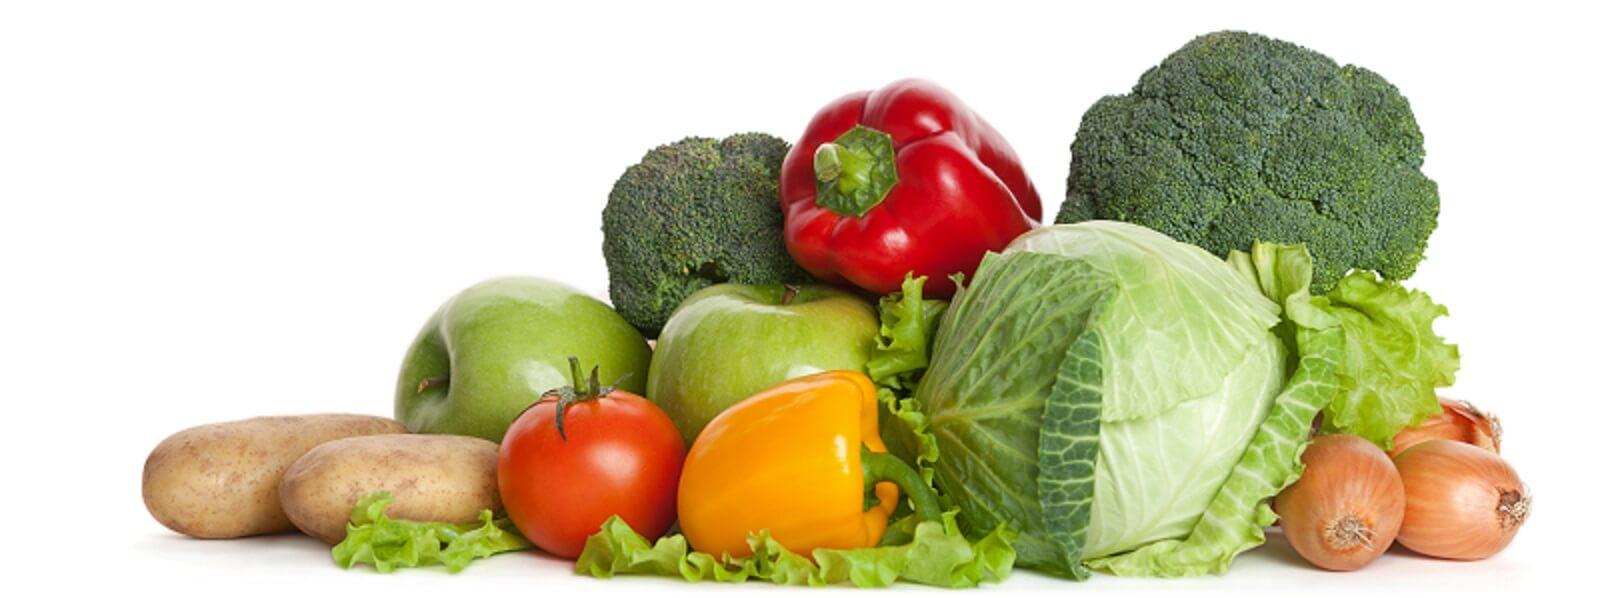 WIC Fruits and Veggies